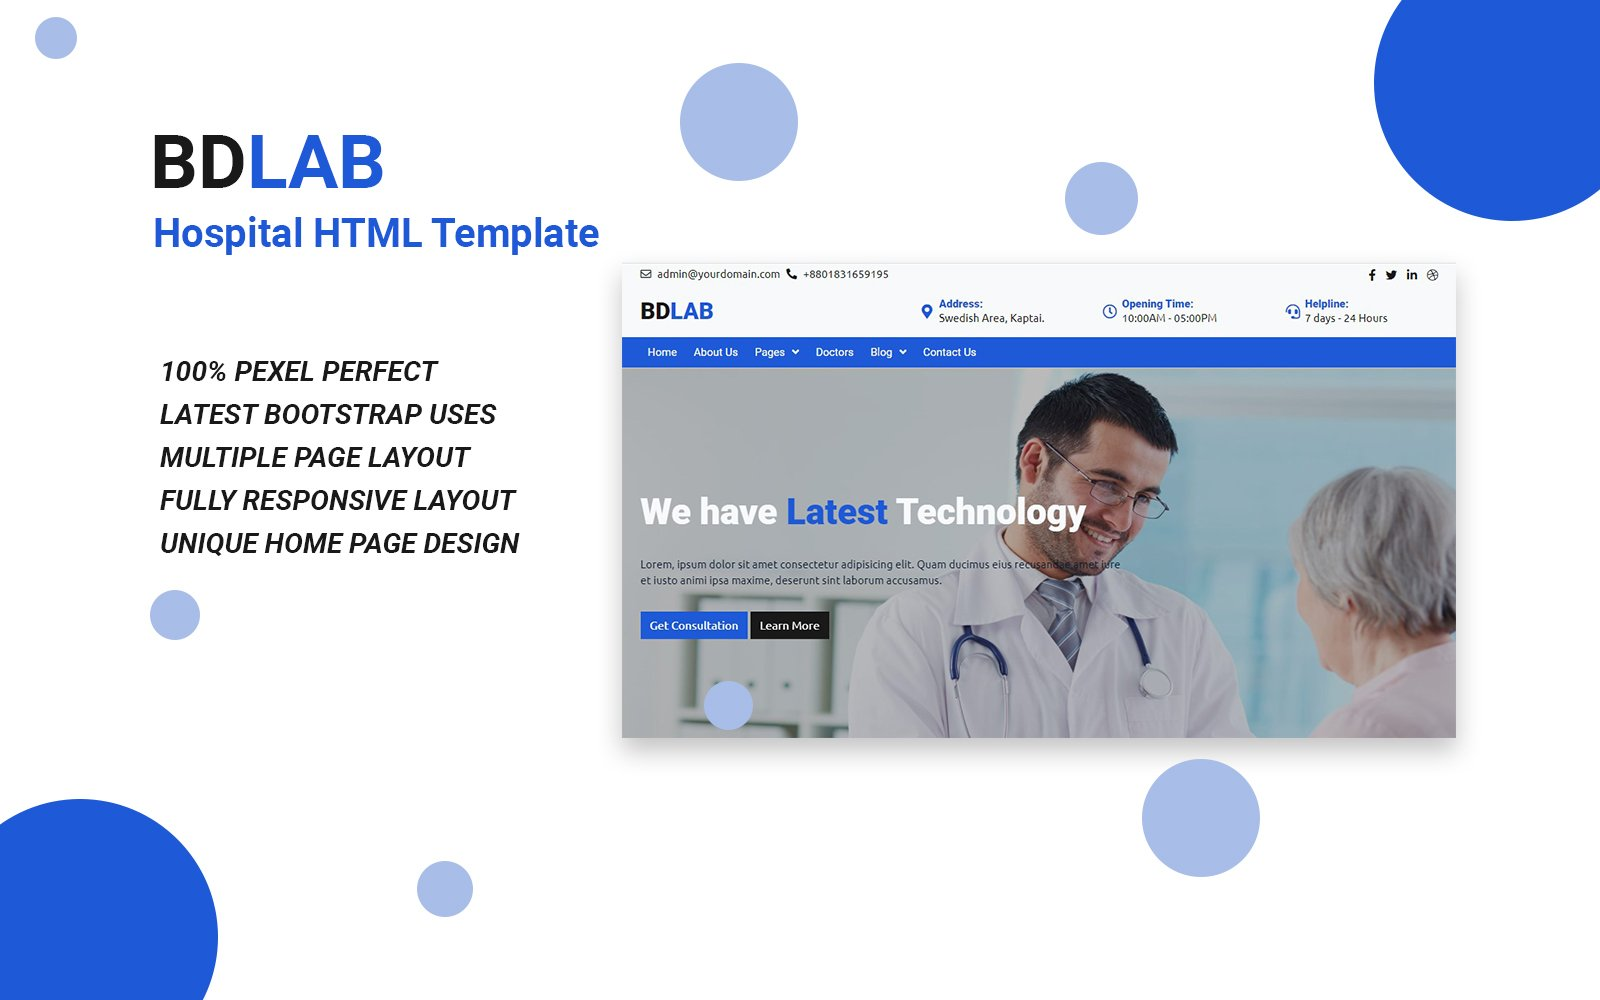 """BDLAB - Hospital HTML Website Template"" 响应式网页模板 #170158"